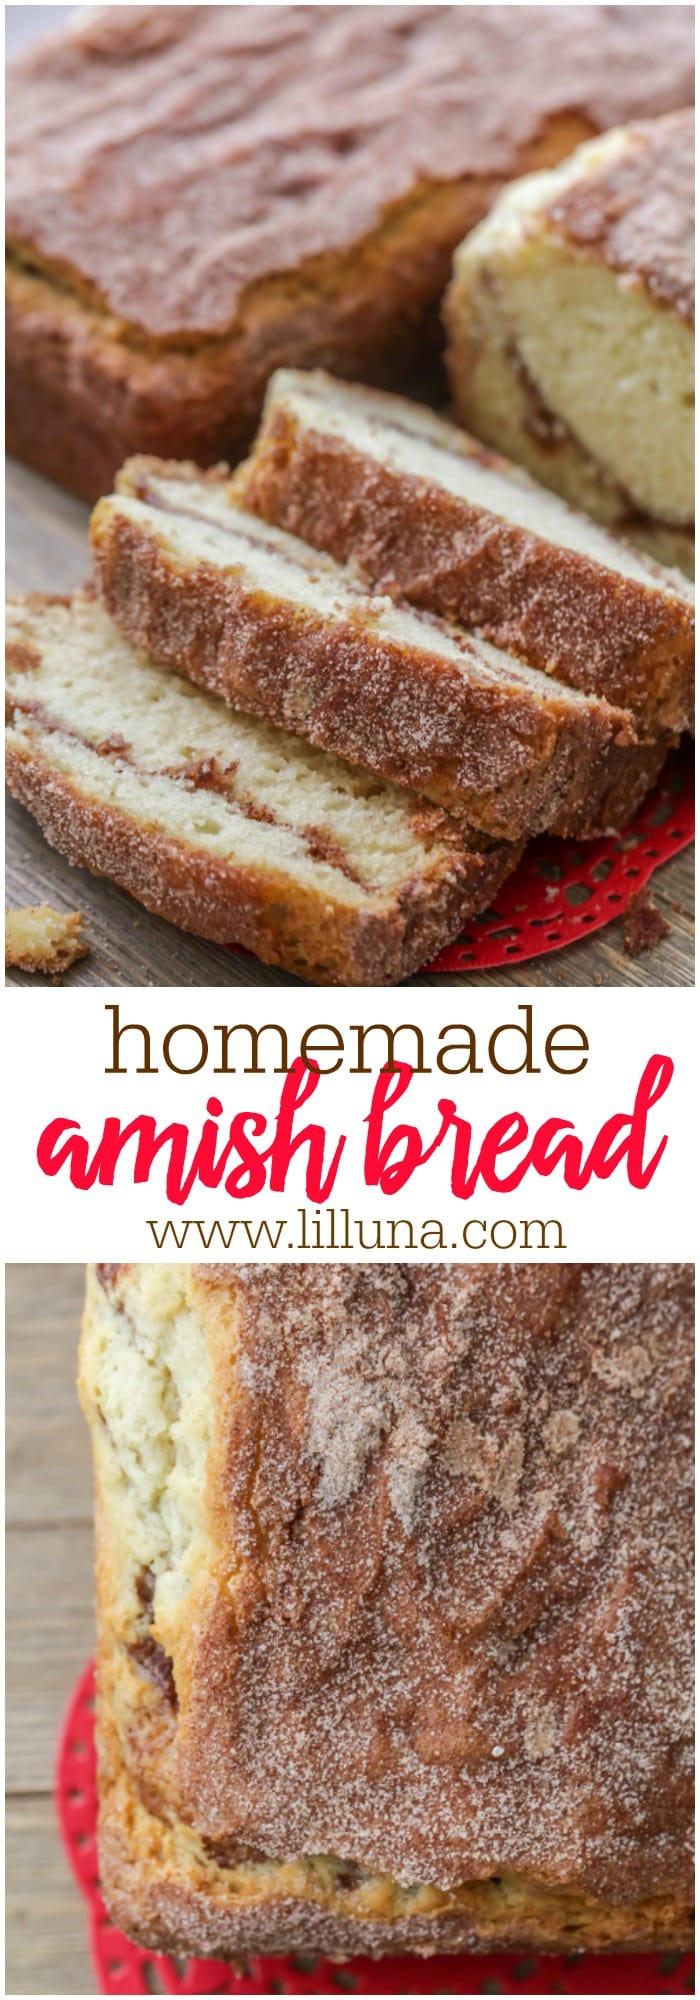 Amish Bread Recipe